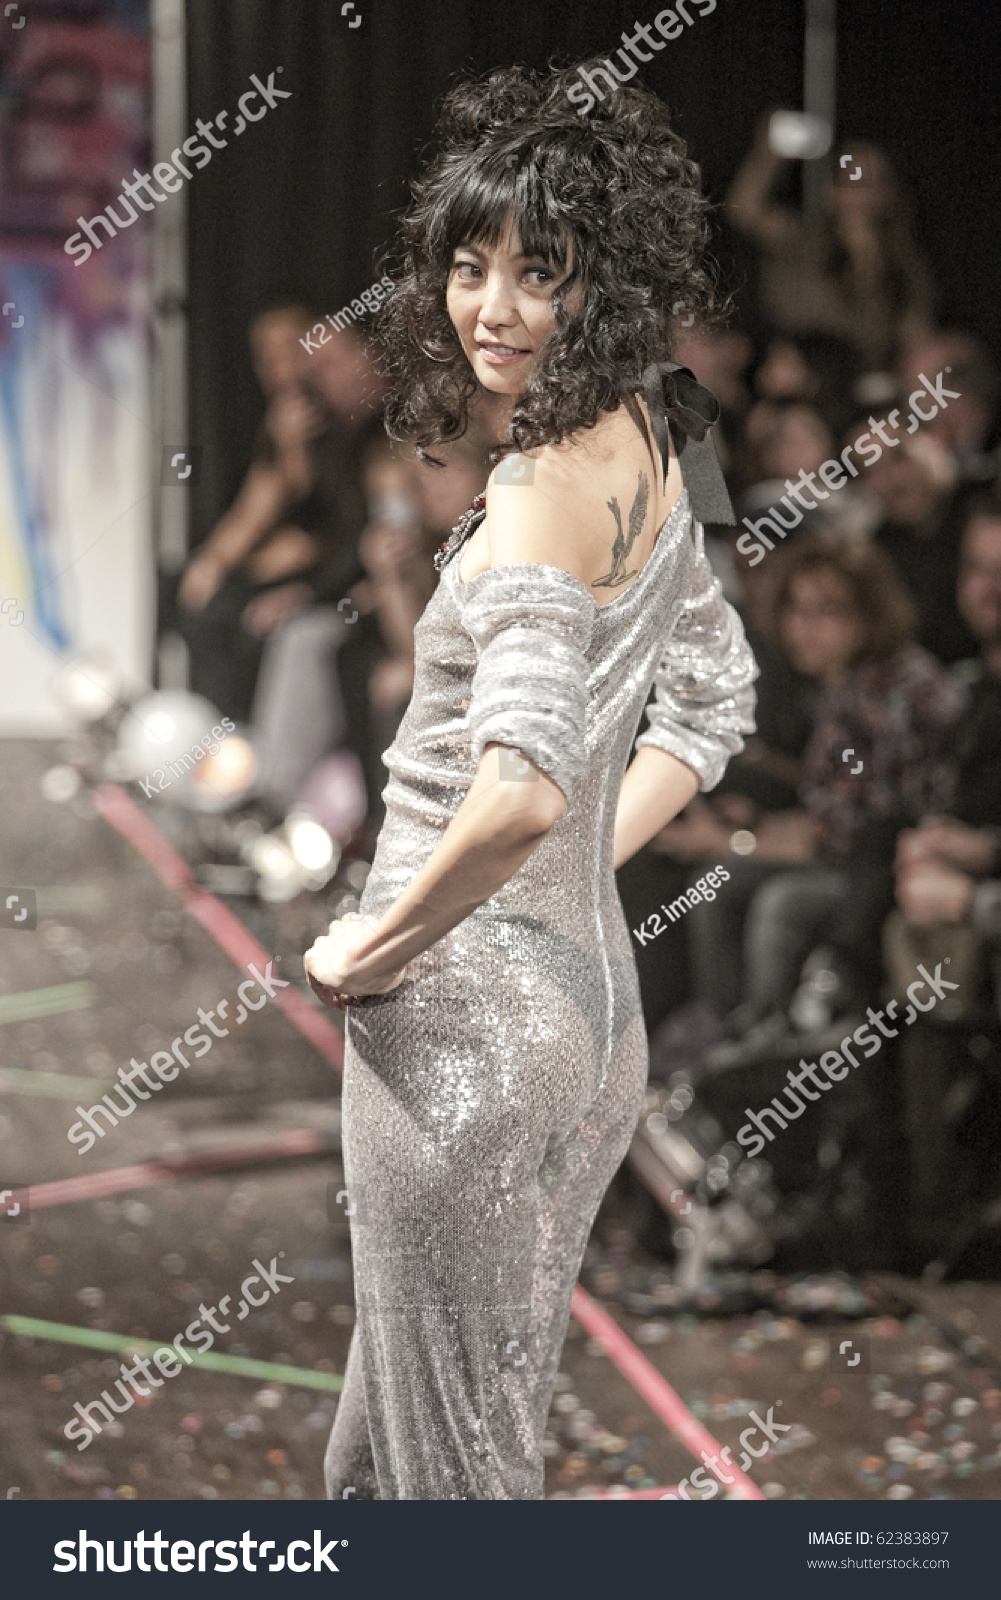 Ashlynn Yennie born May 15, 1985 (age 33),Natalie Casey (born 1980) Adult images Shobu Kapoor,Kelly Trump